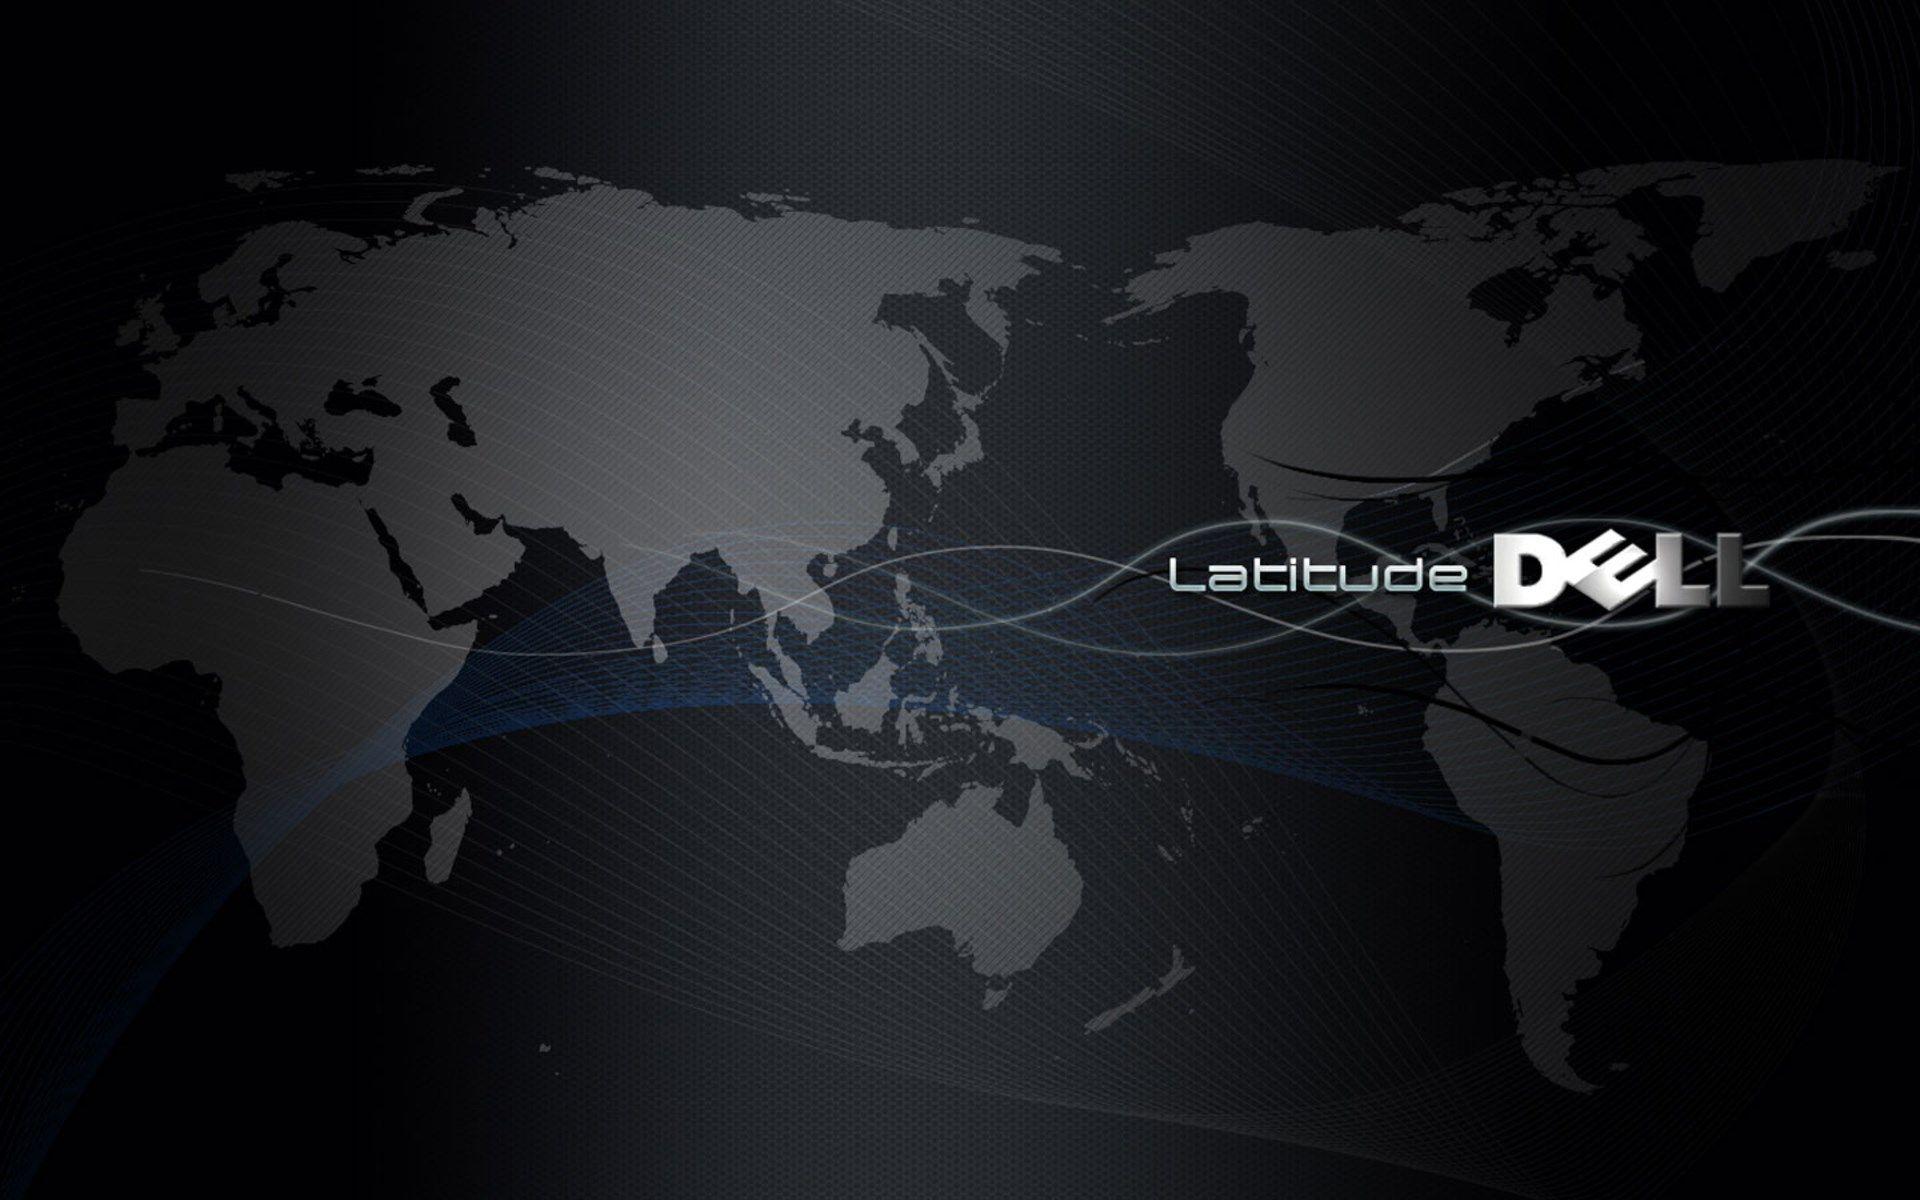 Dell Latitude Widescreen Wallpapers